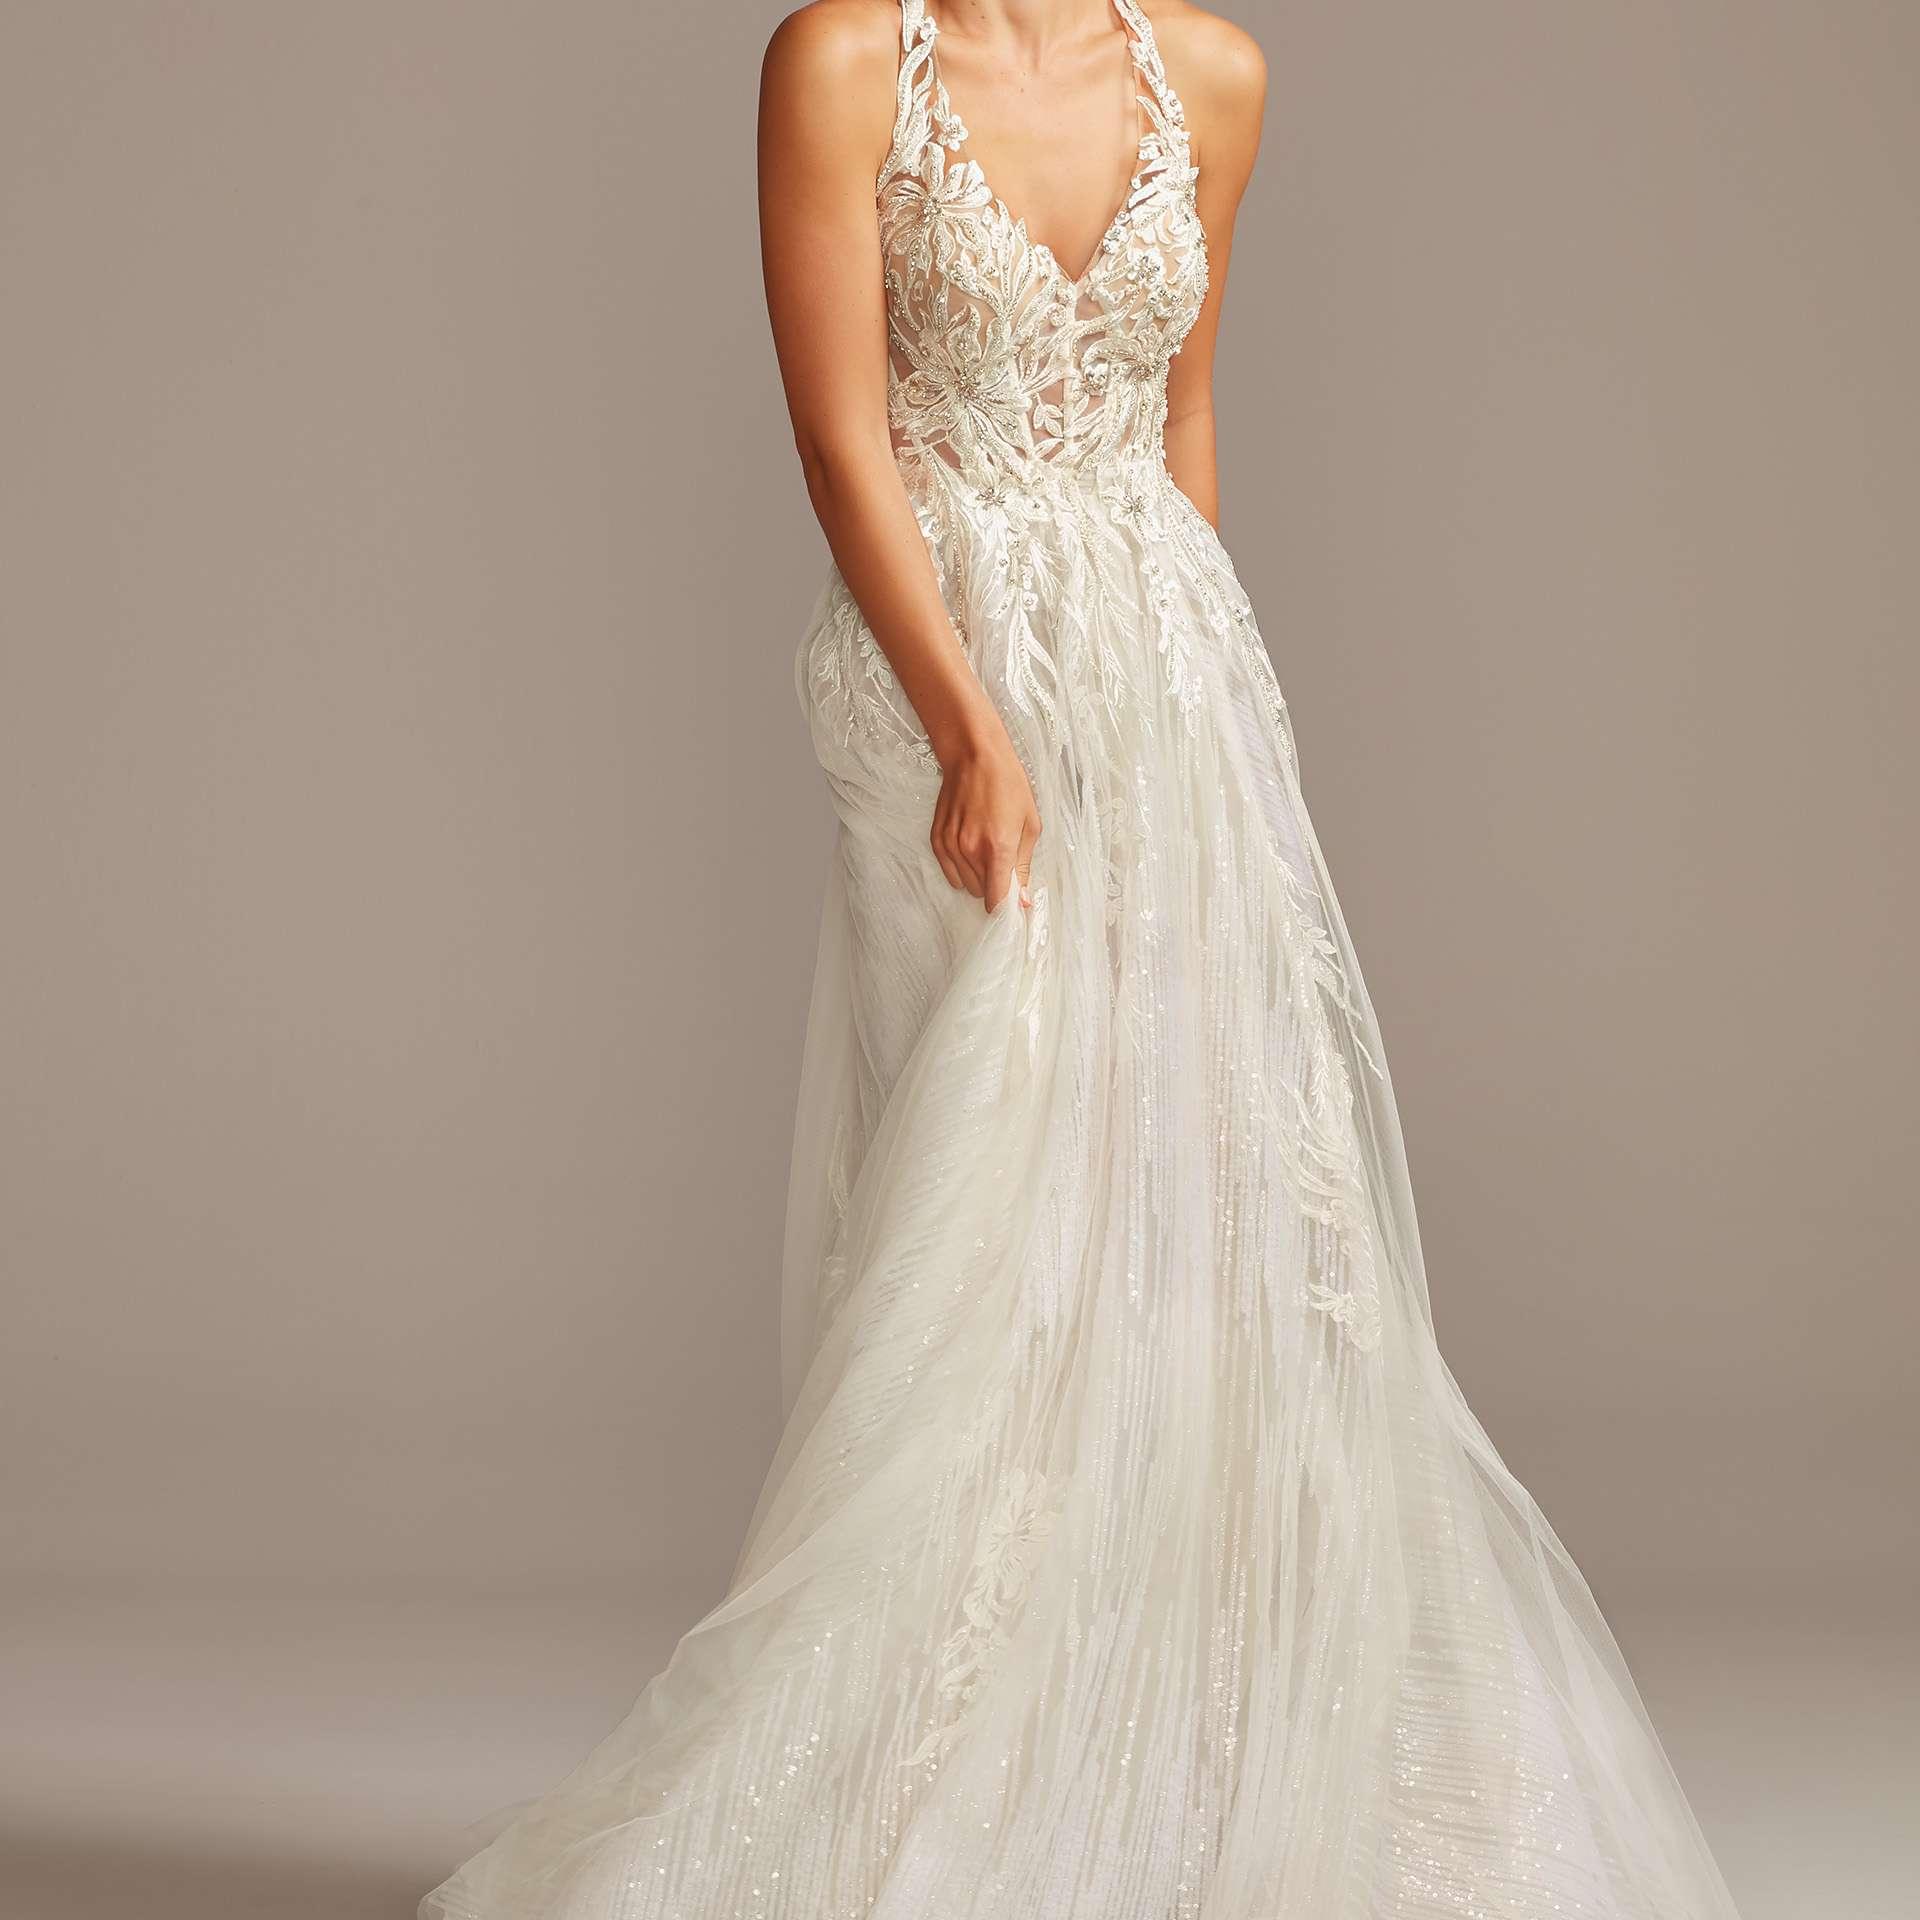 David S Bridal Wedding Gowns: Galina Signature For David's Bridal Wedding Dress